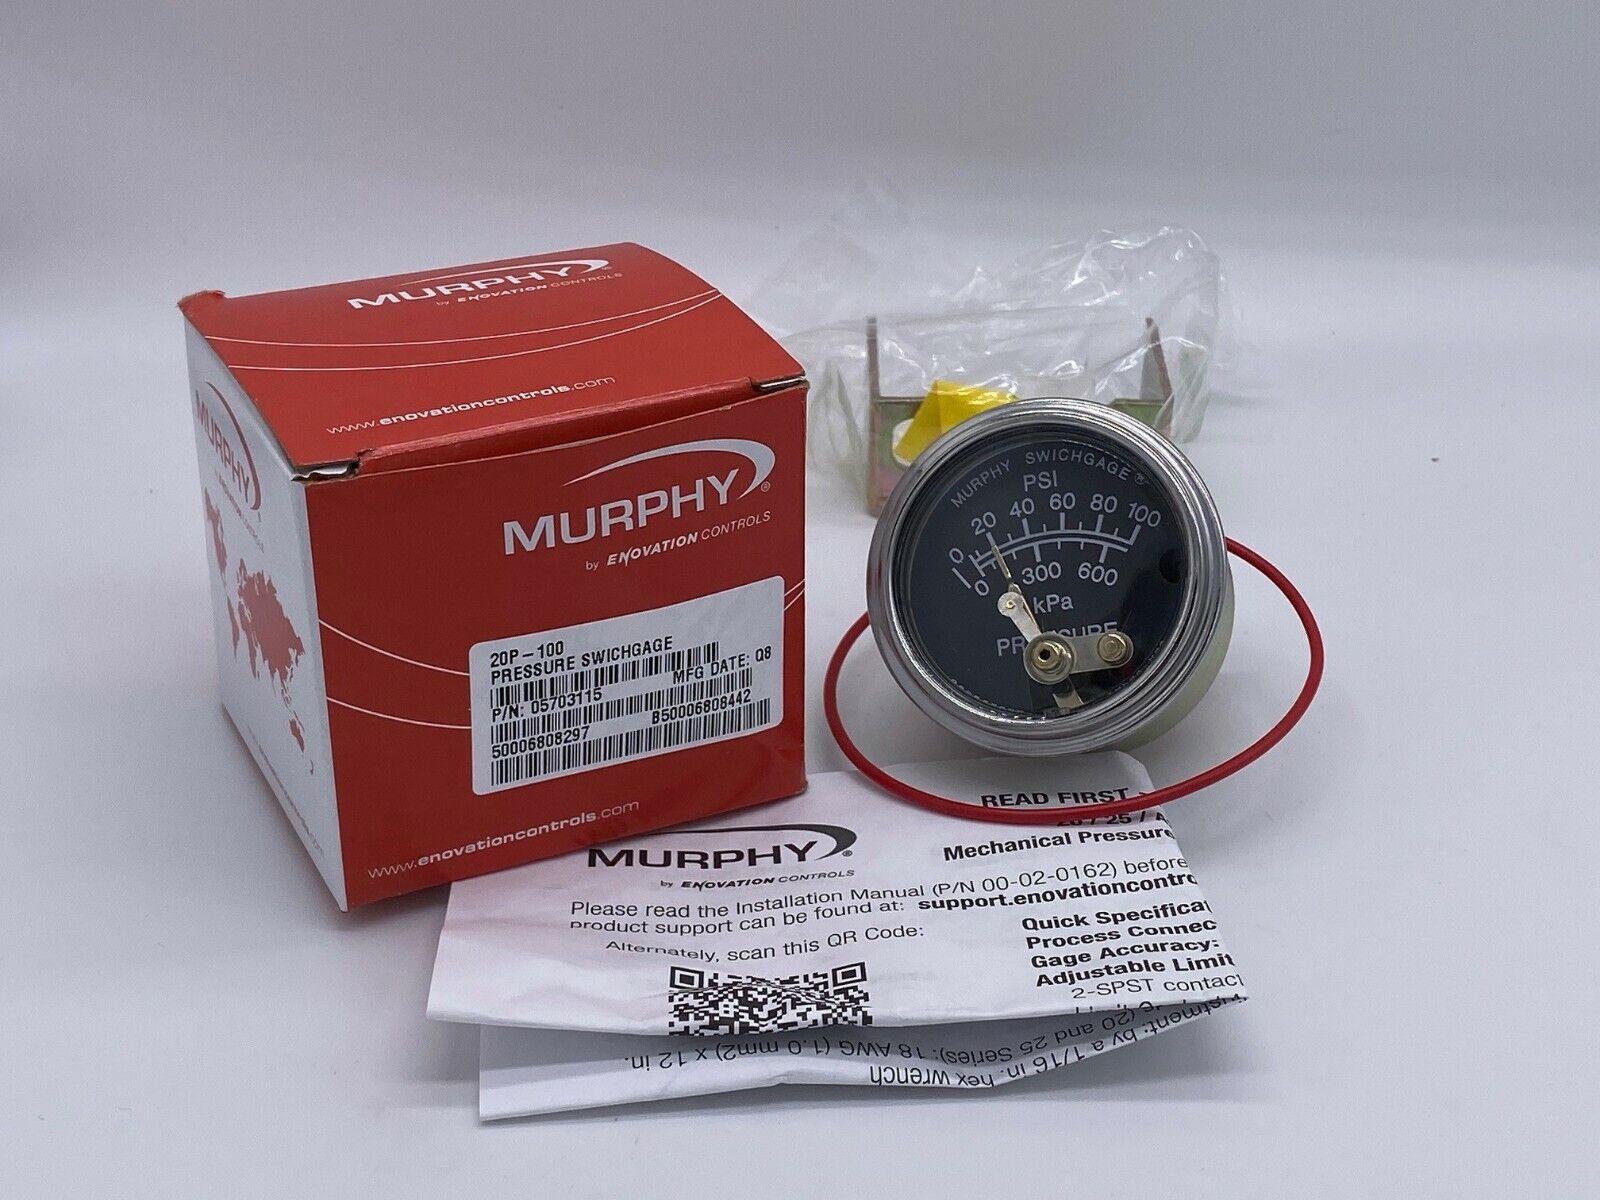 MURPHY 100 PSI OIL PRESSURE GAUGE 20P-100 CONSTRUCTION EQUIPMENT /& WOOD CHIPPERS